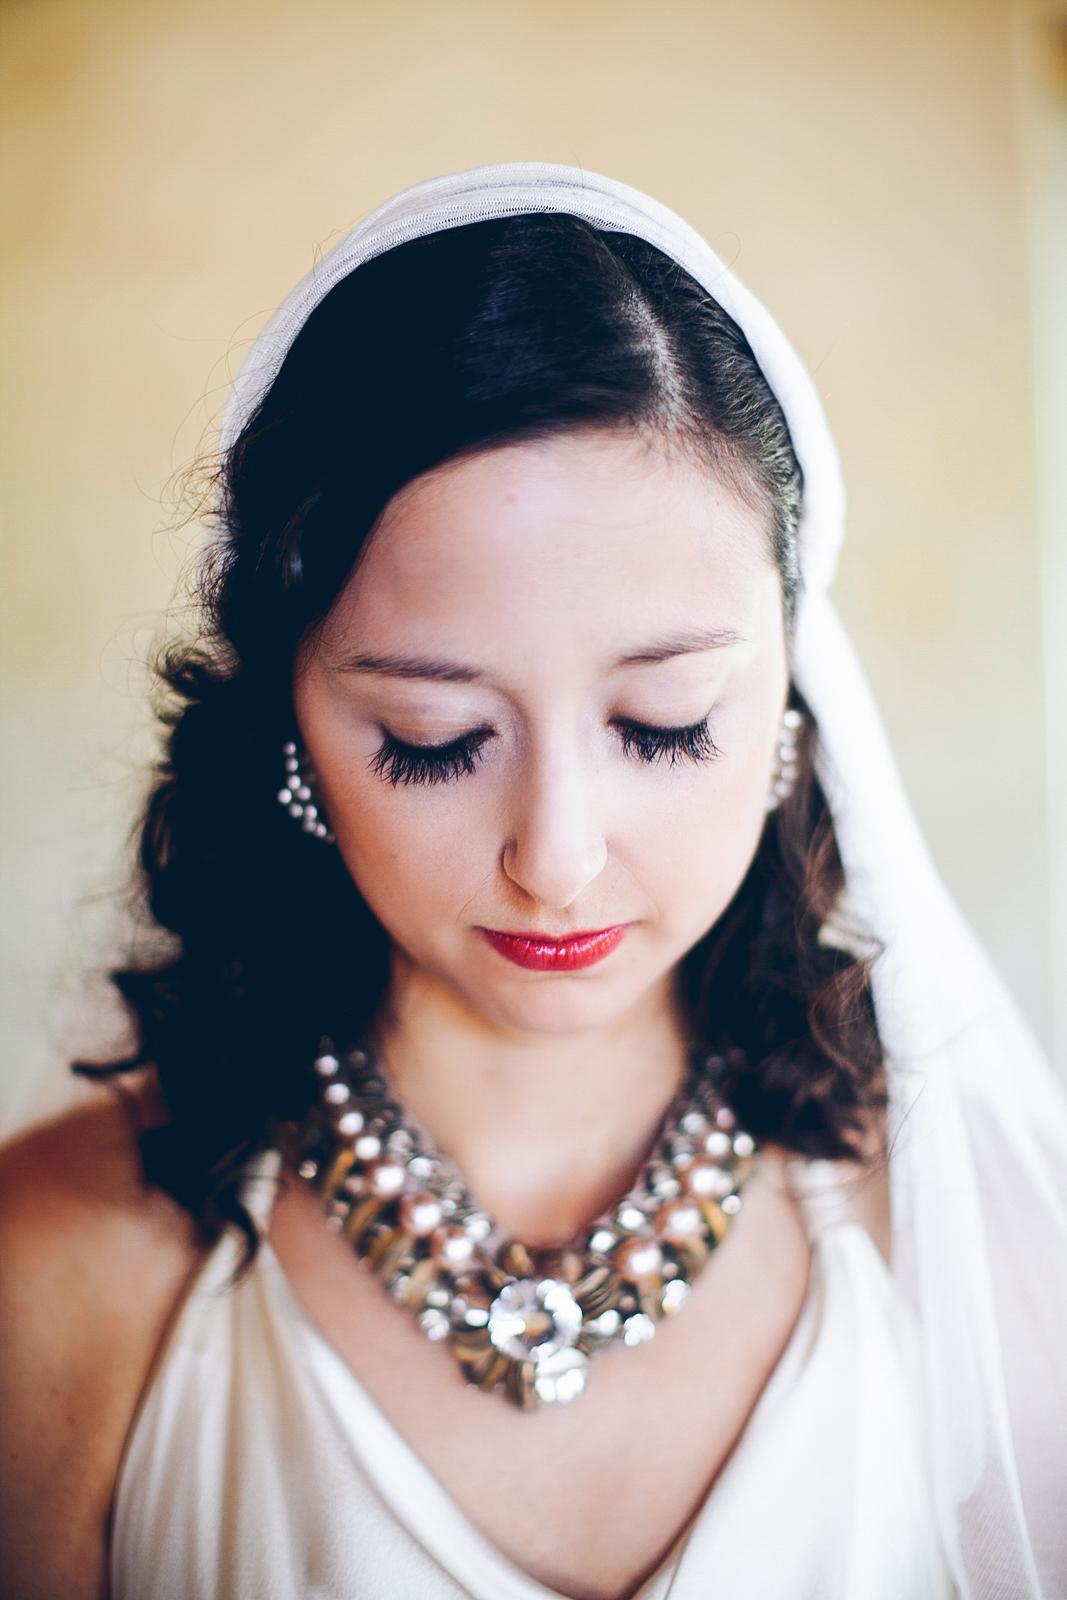 miraflores_winery_wedding_photography_ian_melissa_ebony_siovhan_bokeh_photography_04.jpg